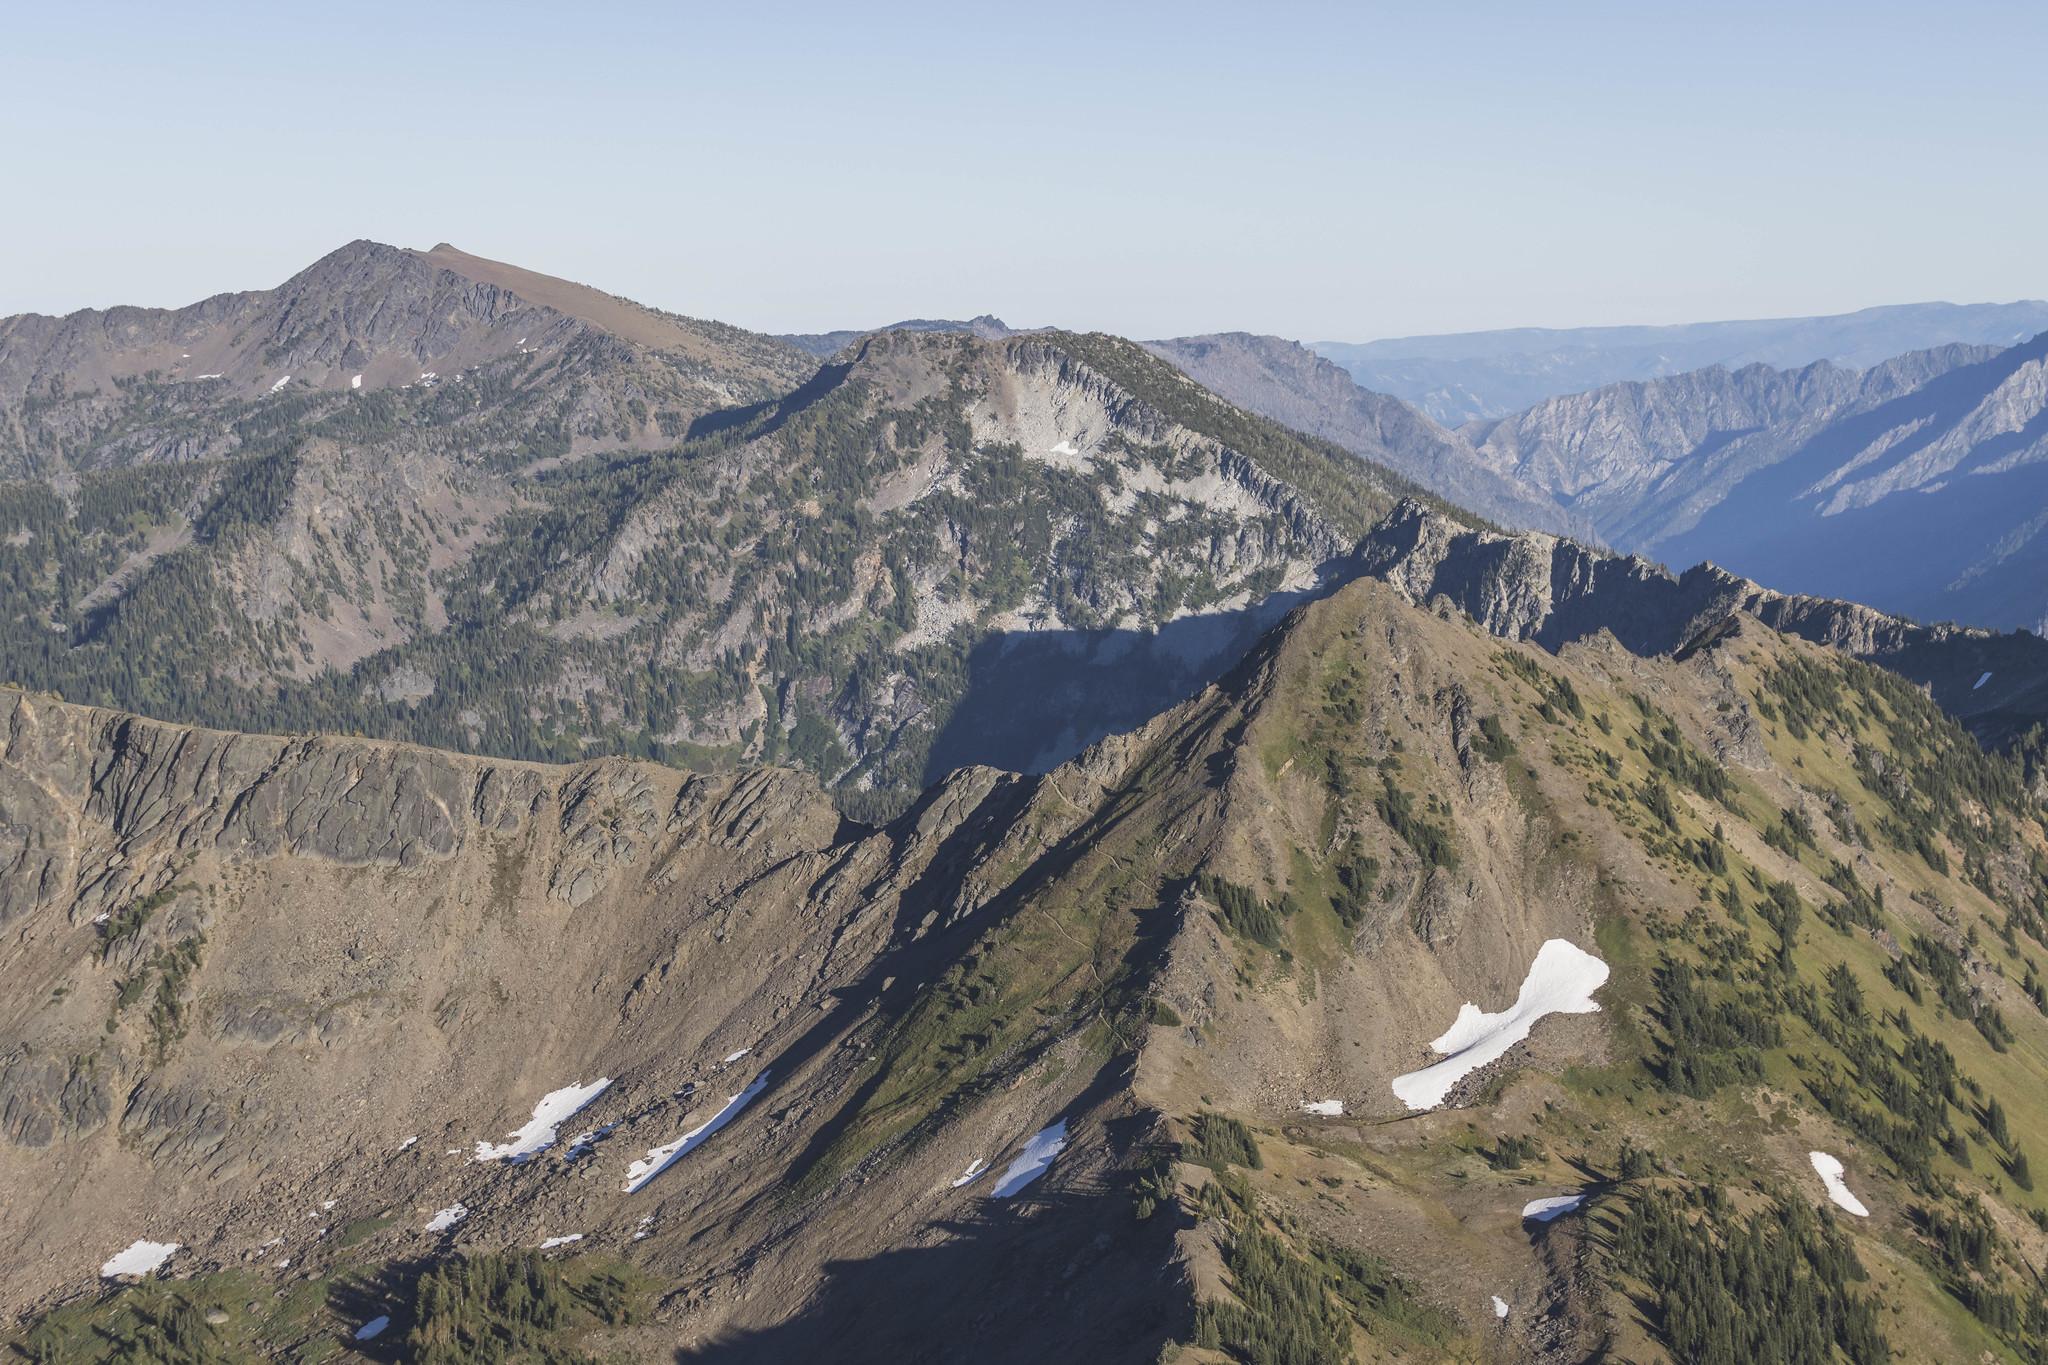 Big Lou, Frigid Mountain, Cape Horn